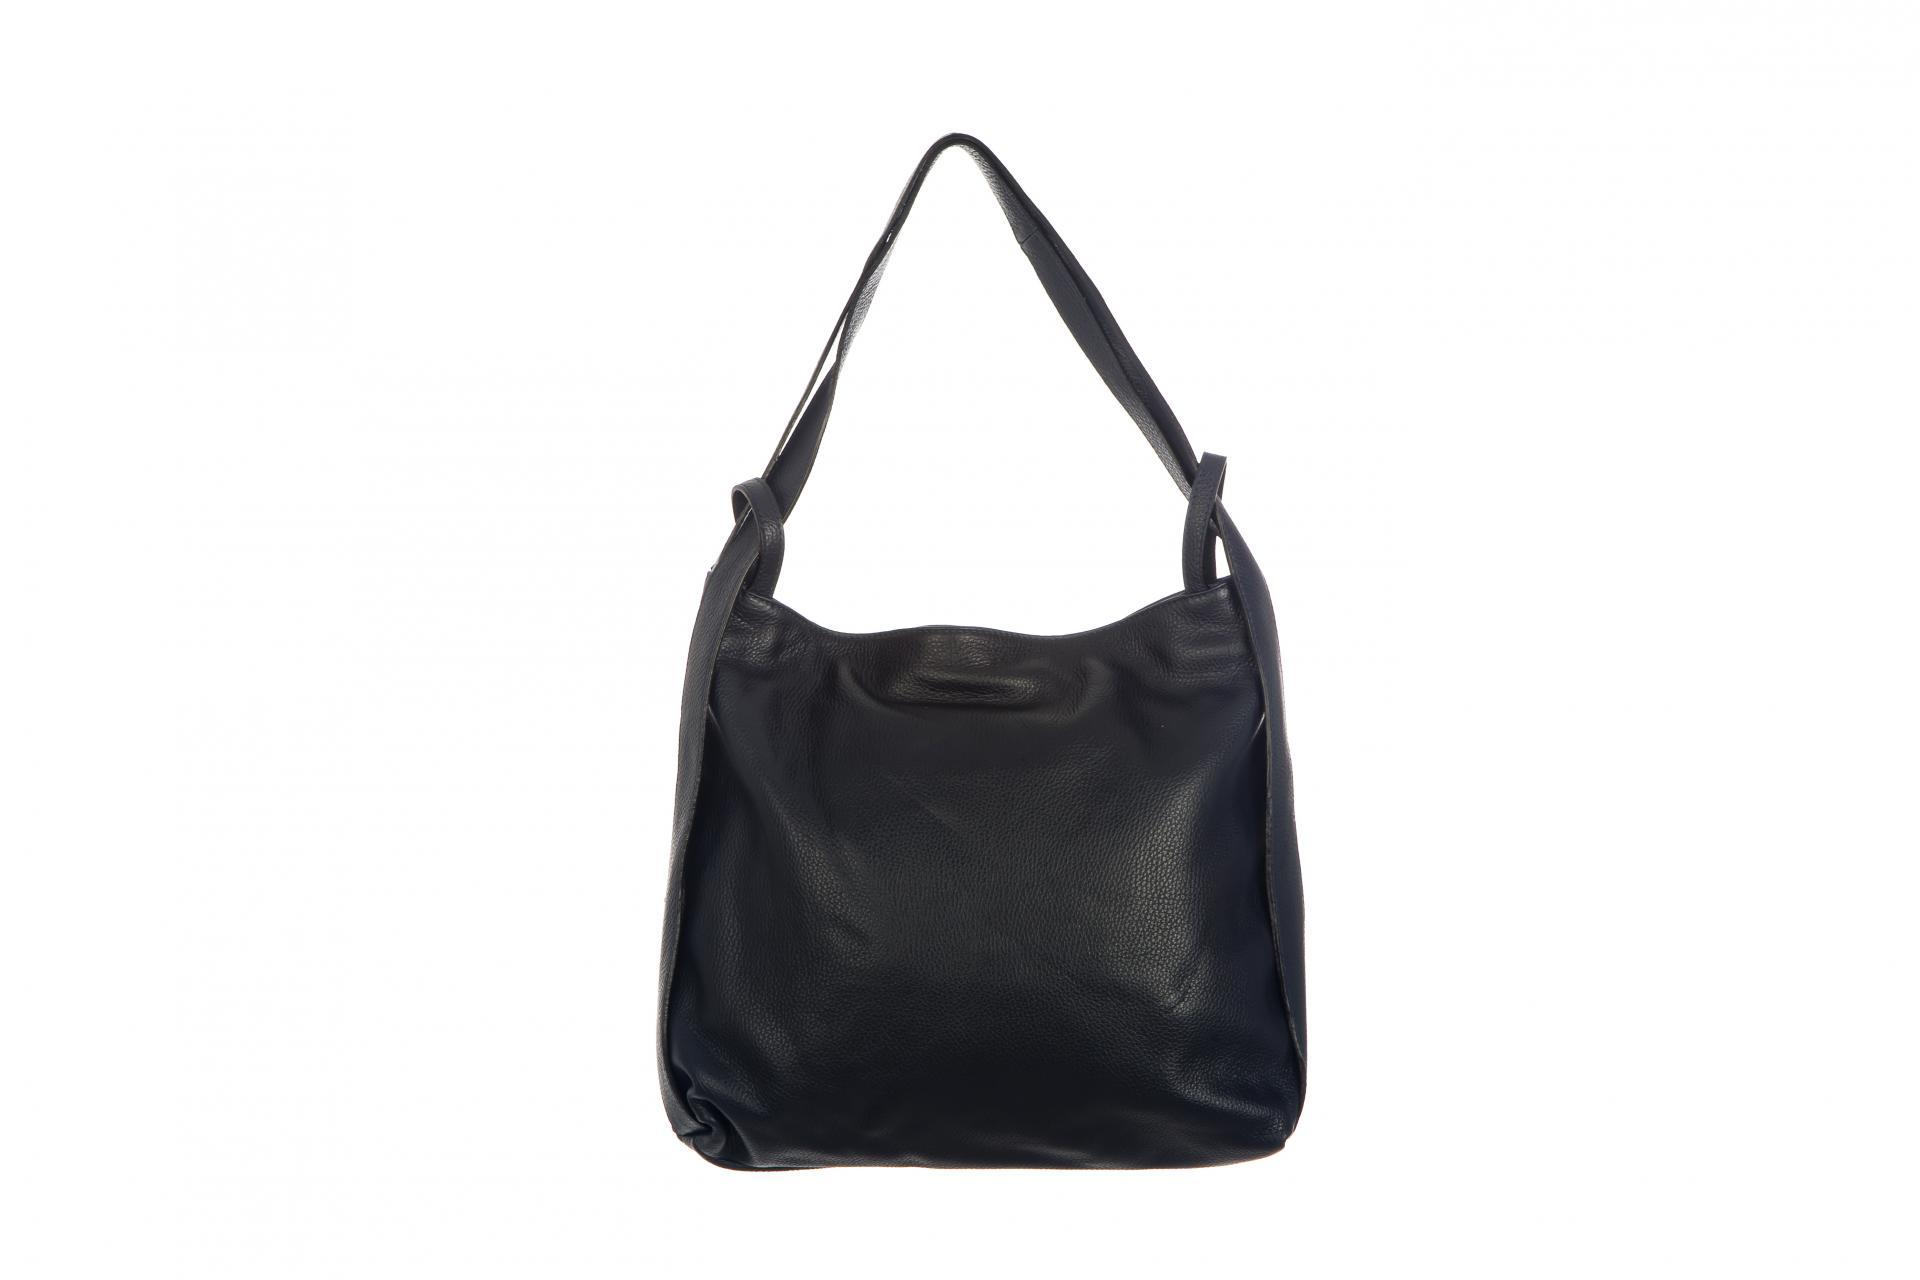 mochila saco azul marino (1).jpg